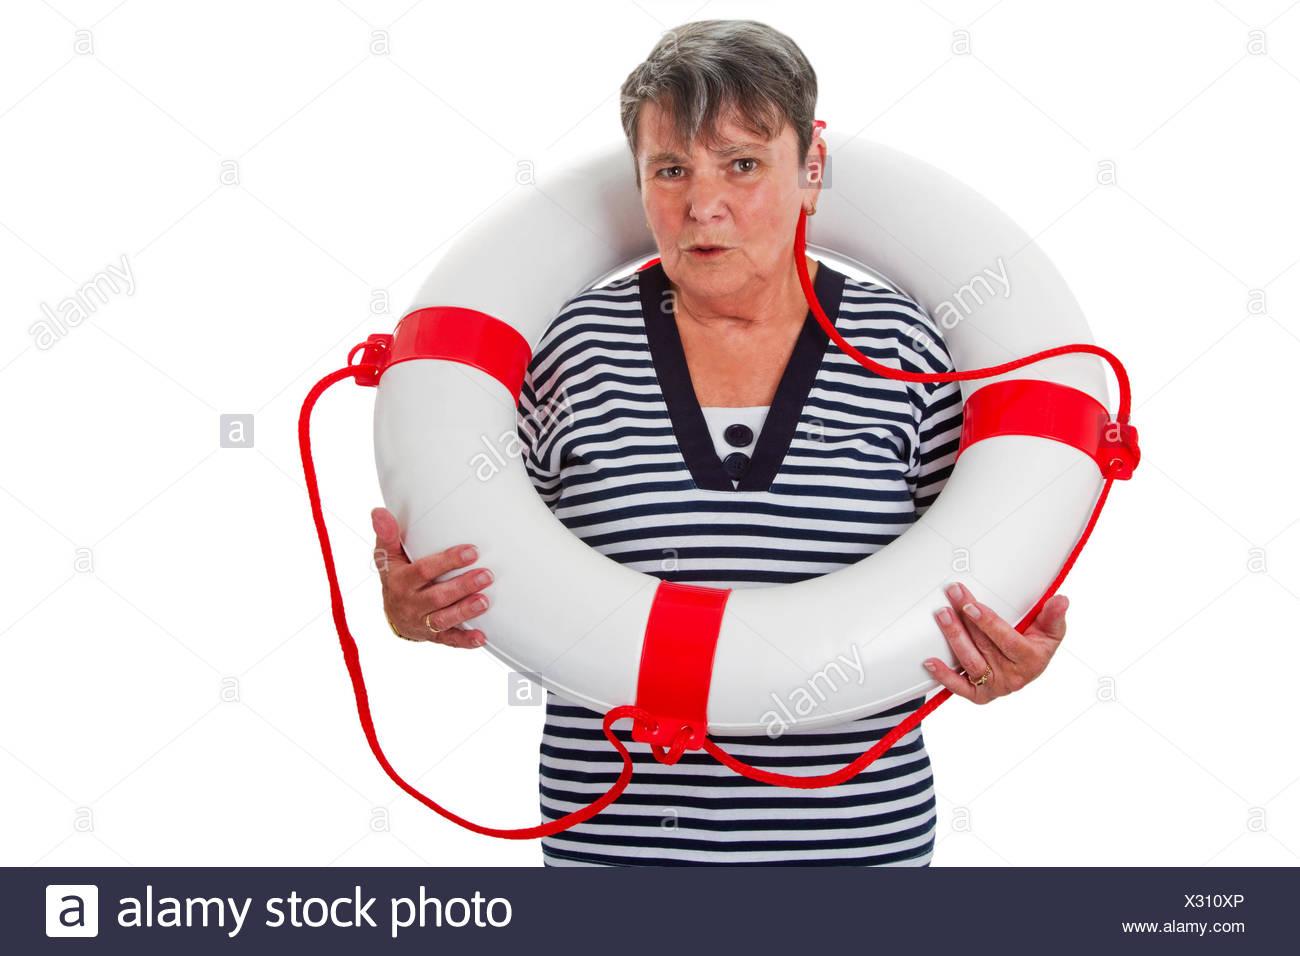 Seniorin mit Rettungsring - Freisteller Stock Photo